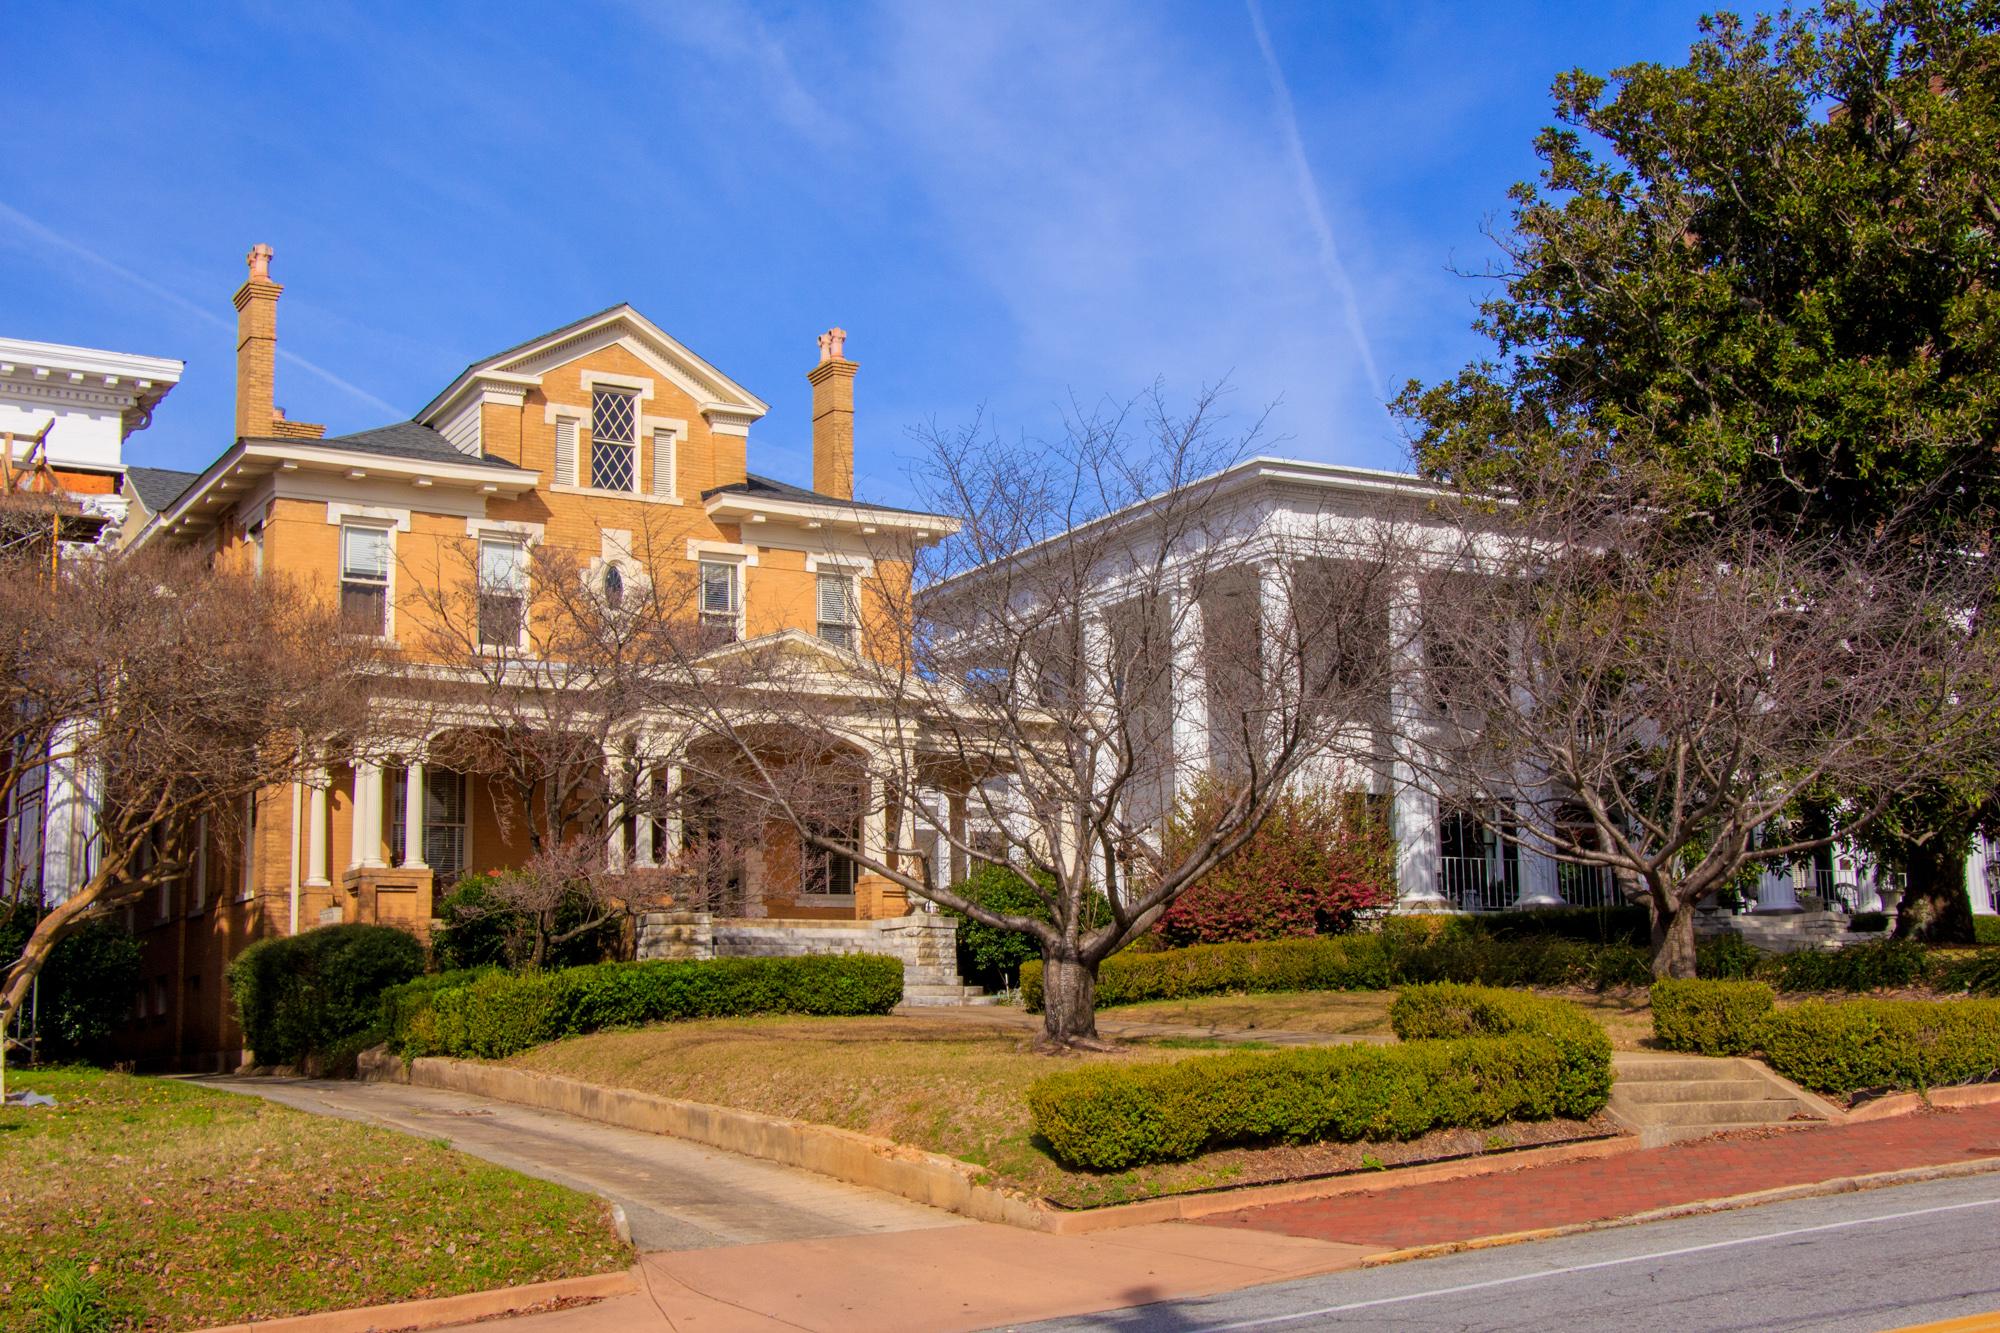 College Street Manors. Macon, Georgia